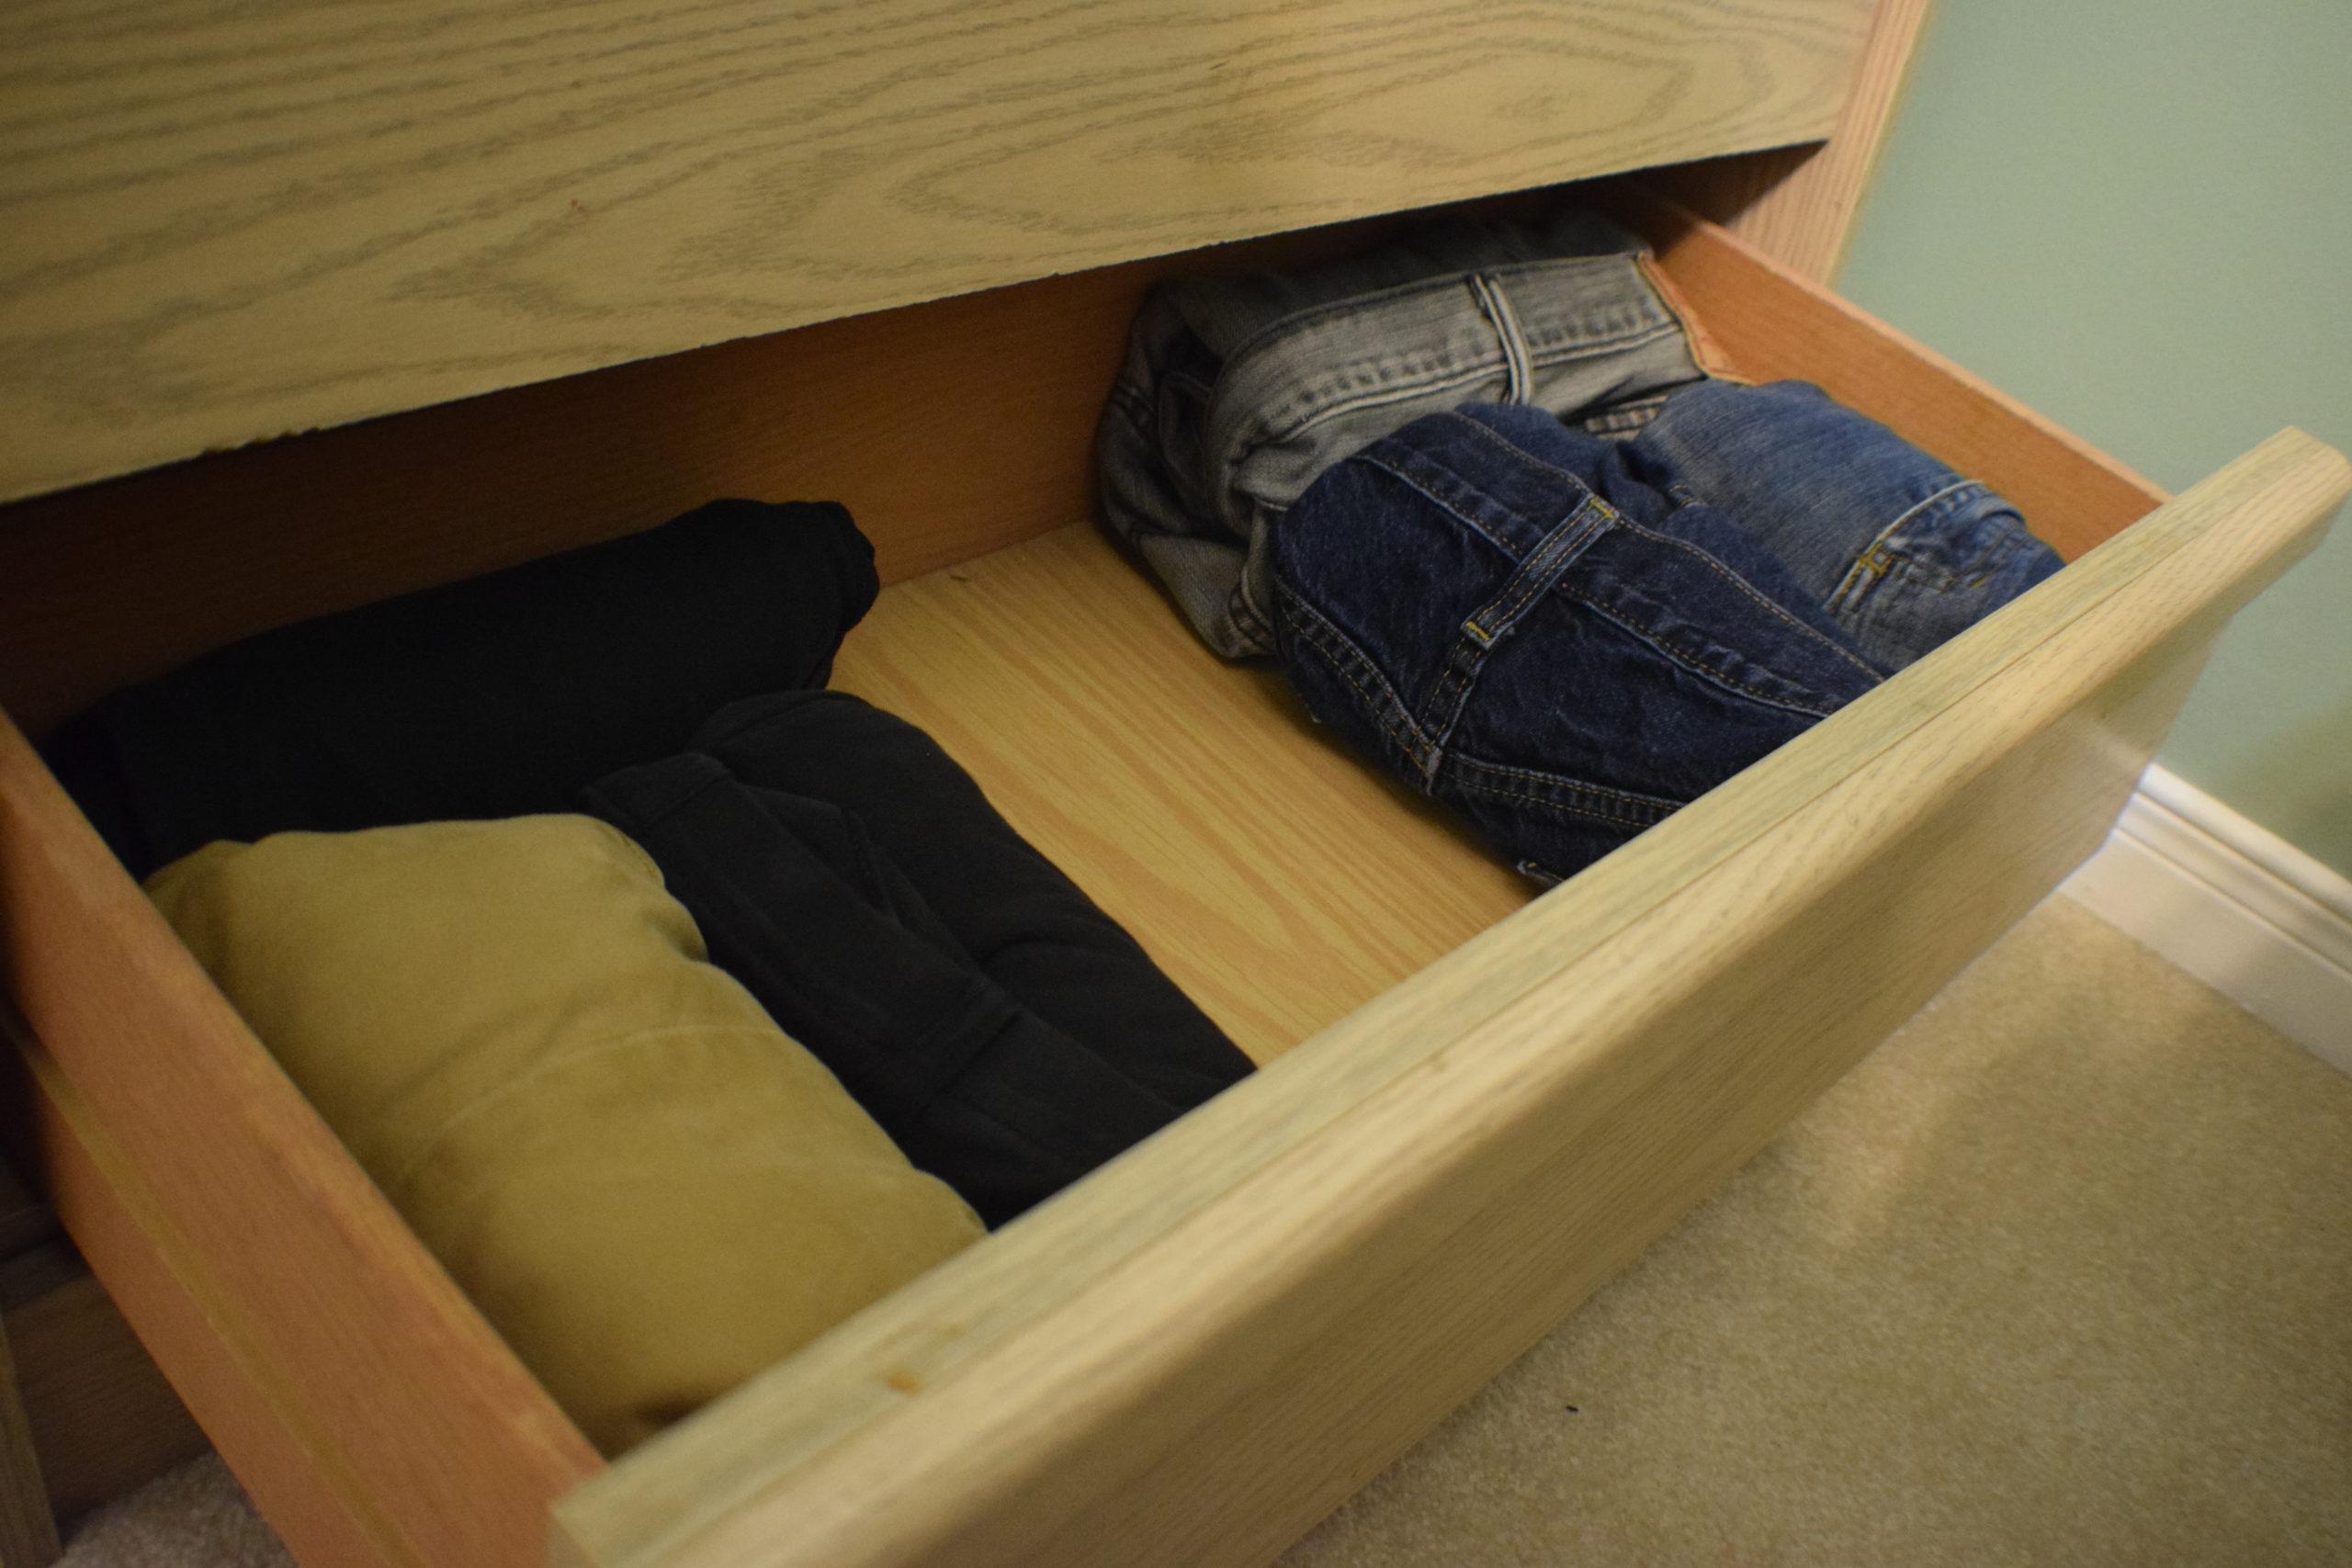 rolled pants in bottom drawer of light wood dresser